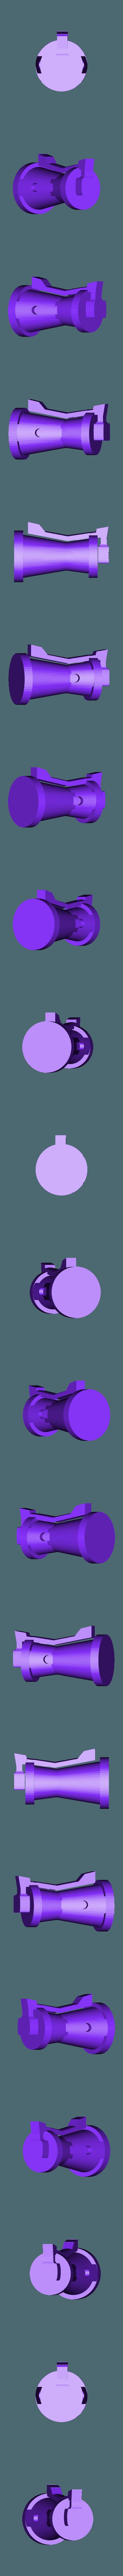 grenade.stl Download STL file Fortnite grenade • 3D printer model, Freesty